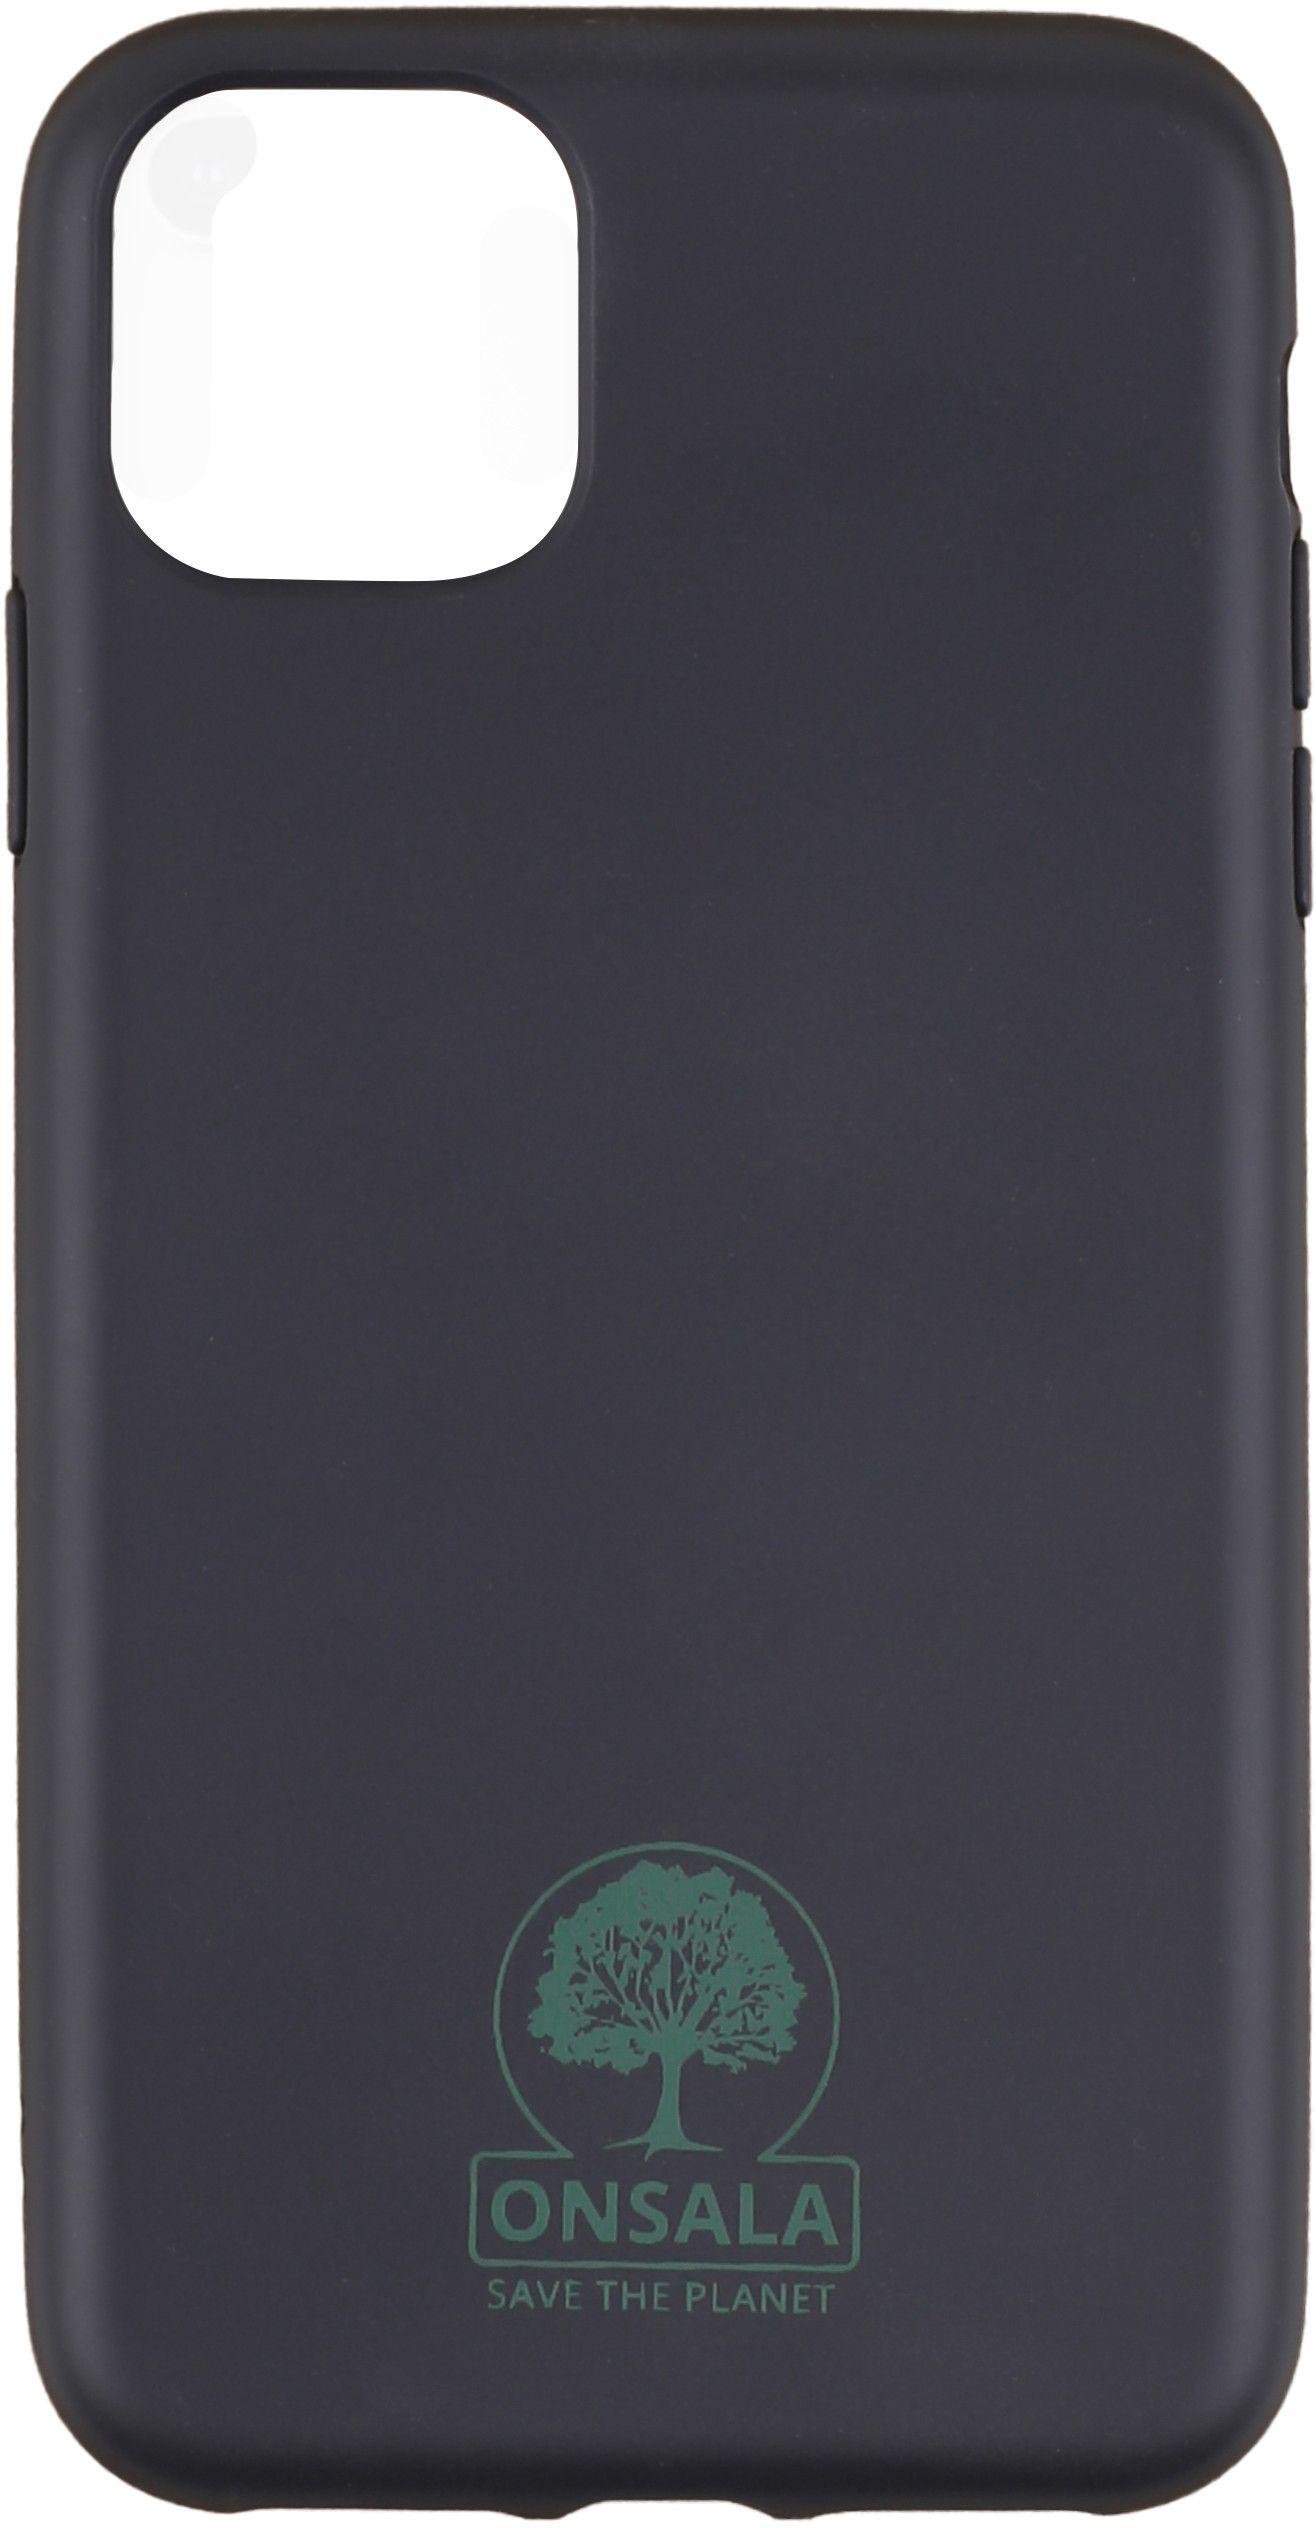 Gear Onsala Eco Case (iPhone 12/12 Pro) - Grön